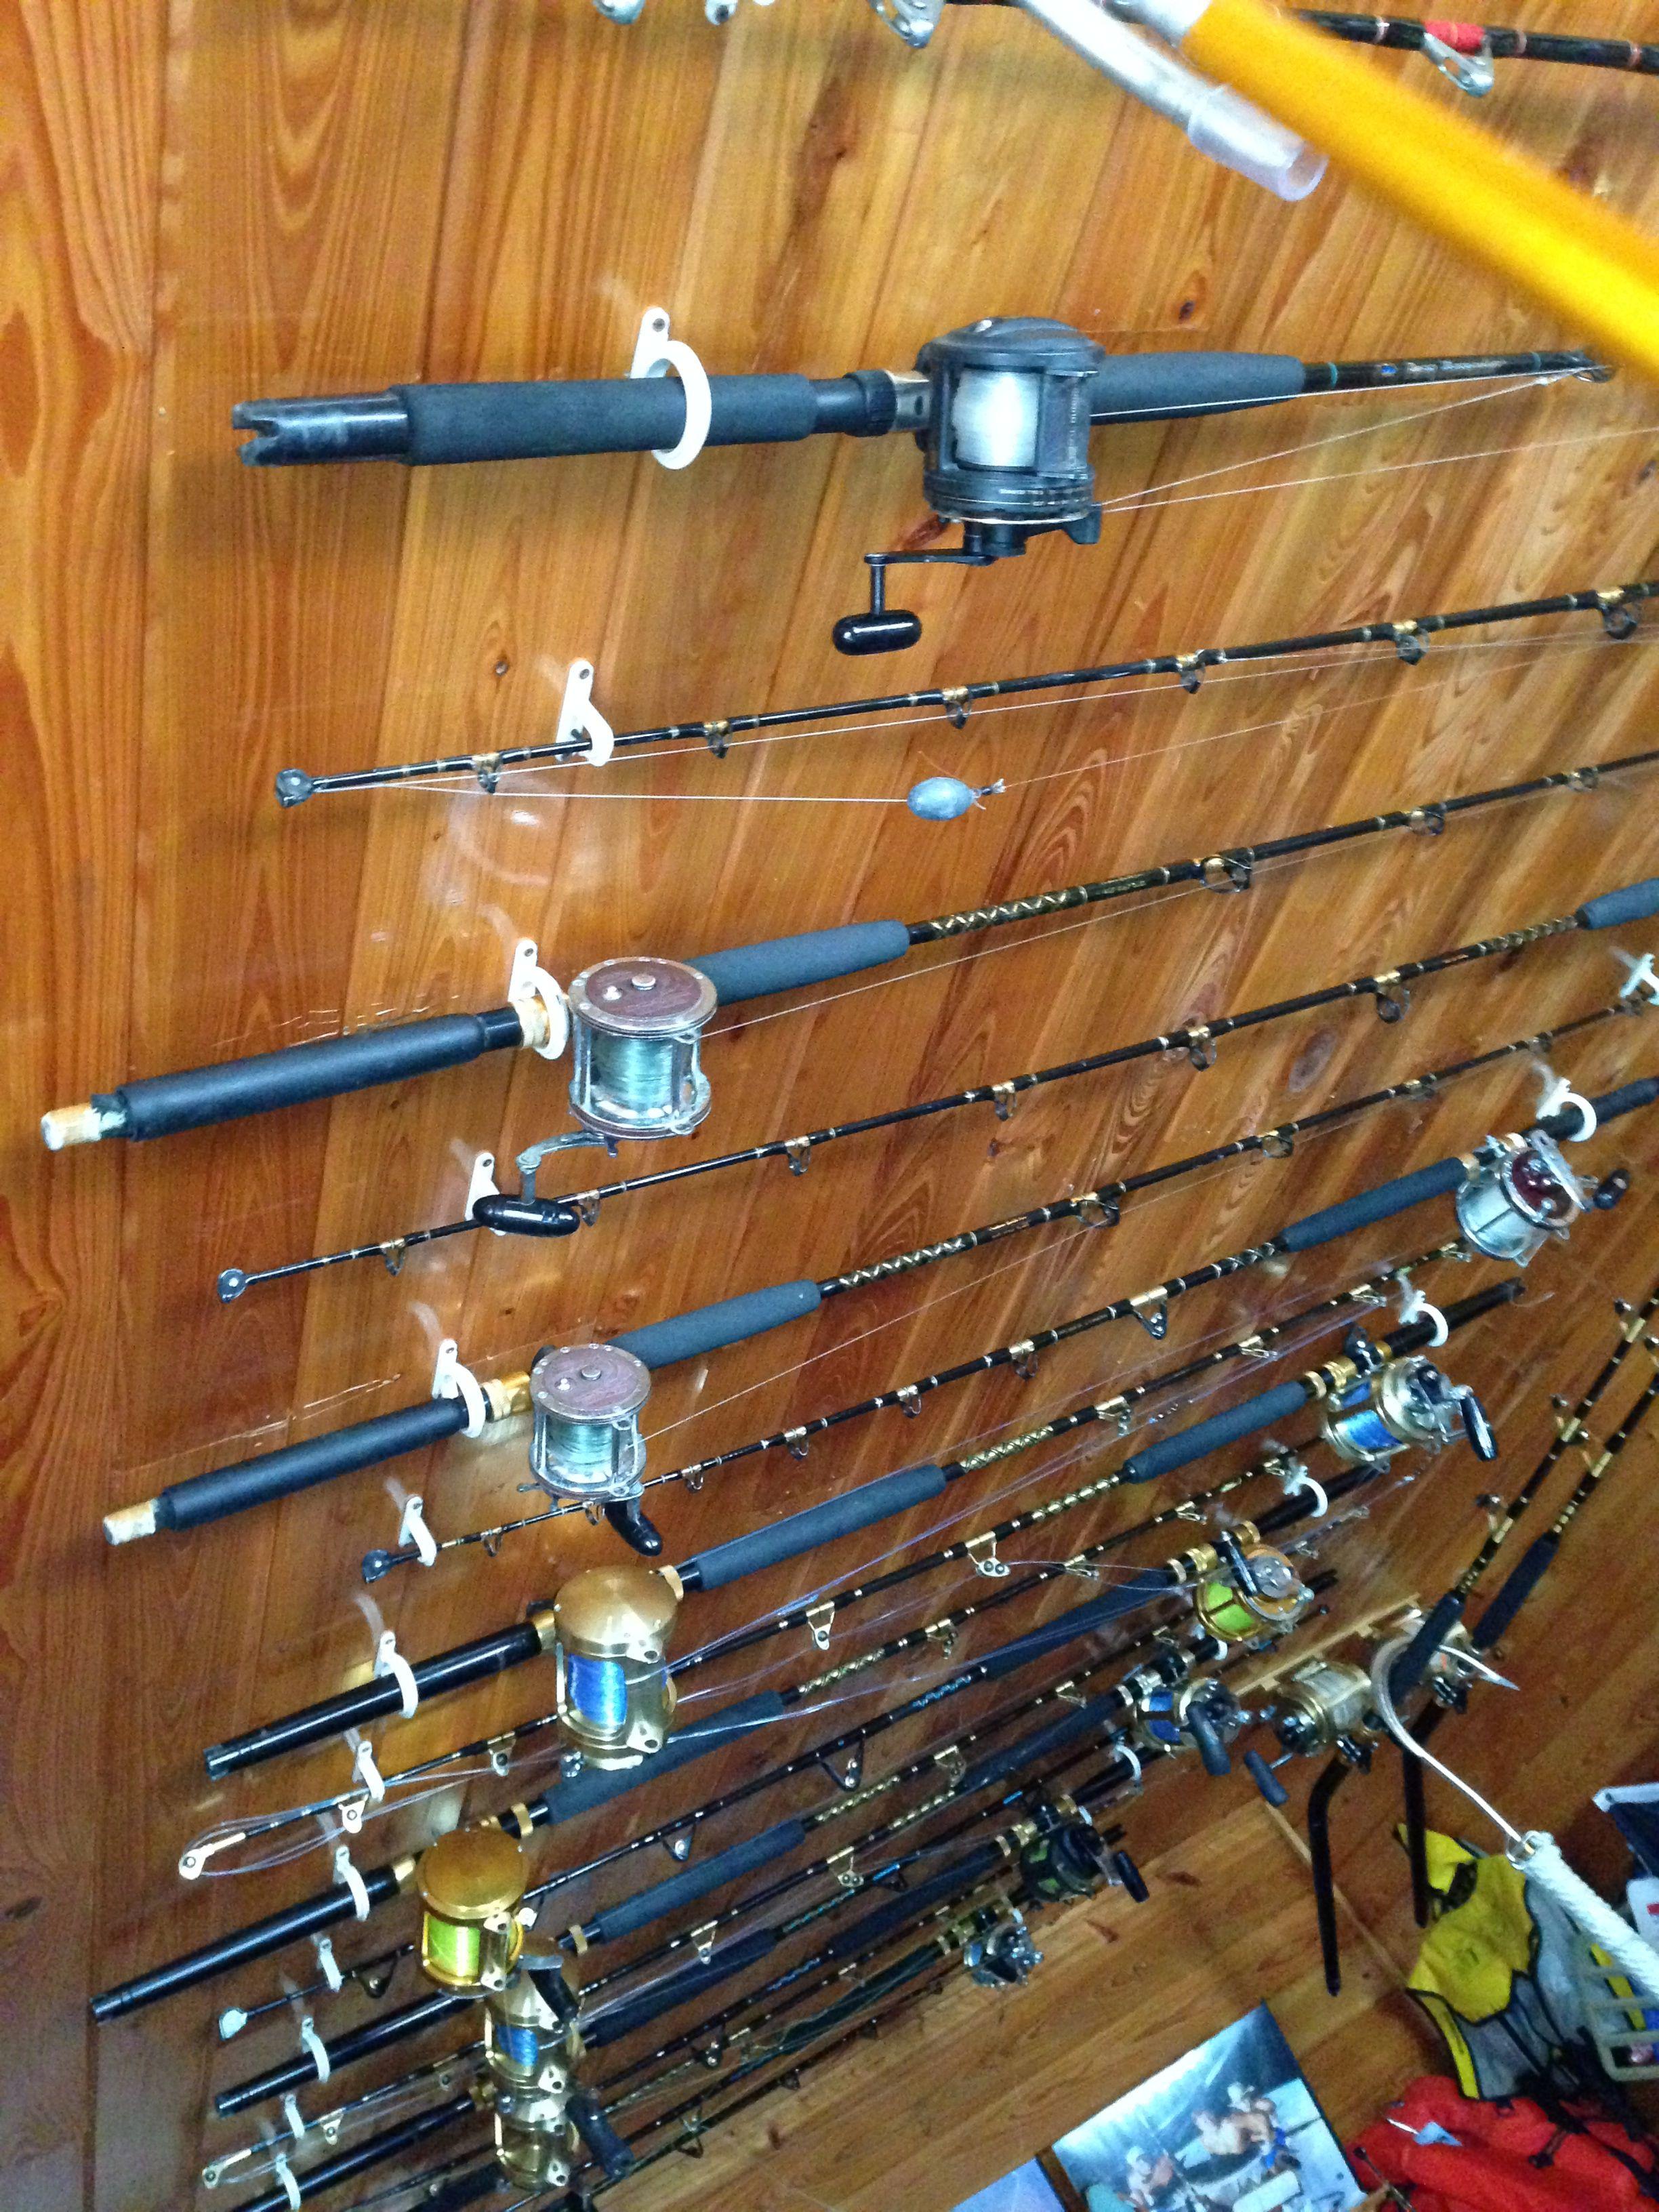 reel s ceilings by storage cabela pin rack mount rod fishing overhead holder pole ceiling holders